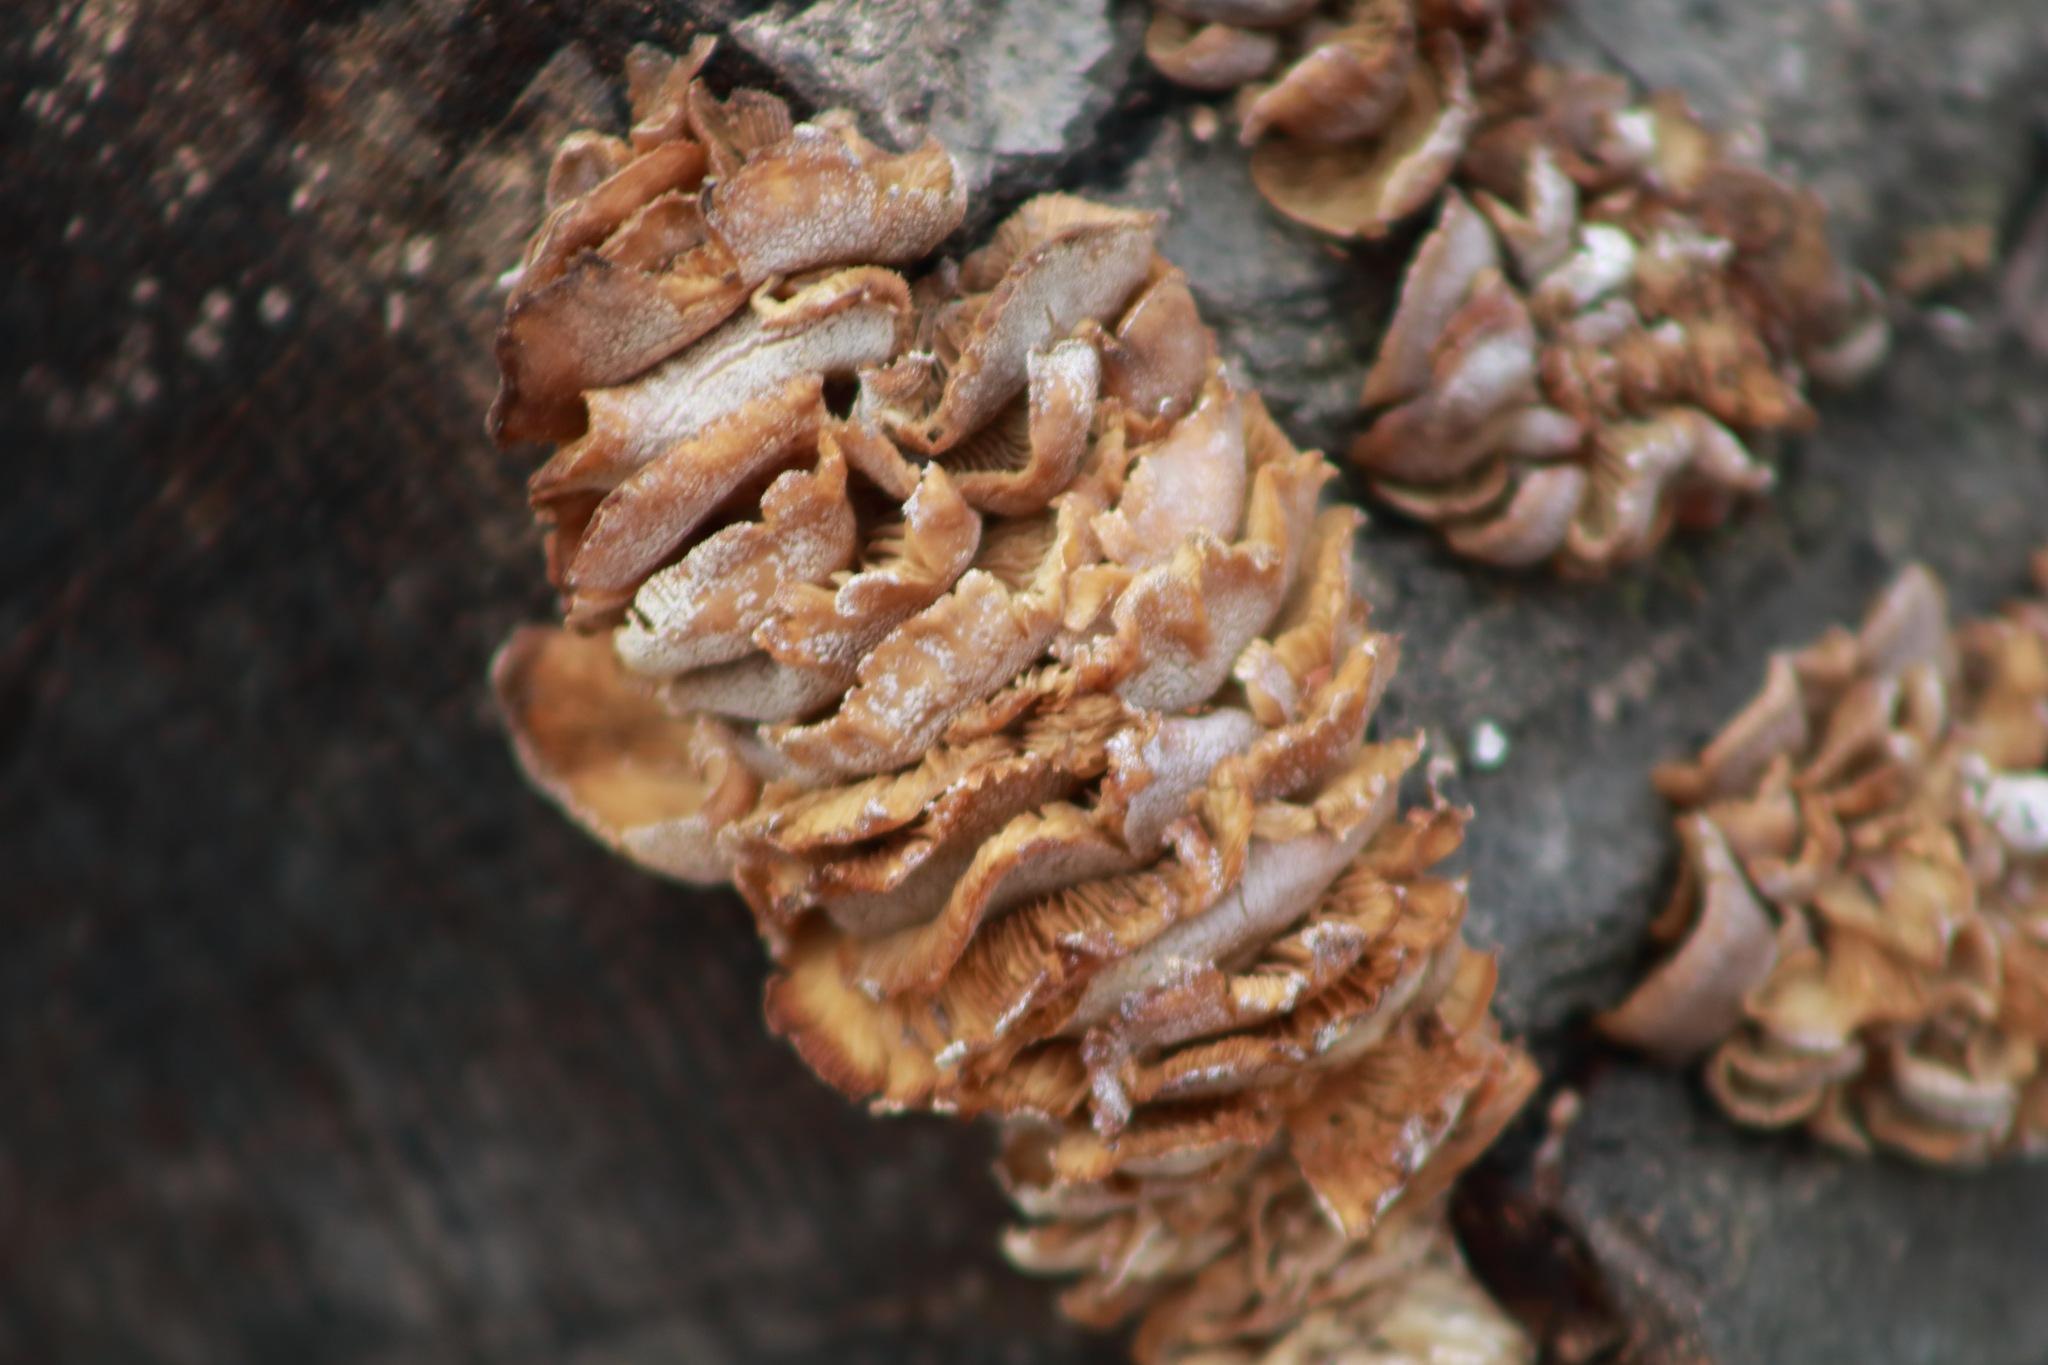 fungi up close! by Peter O Merz